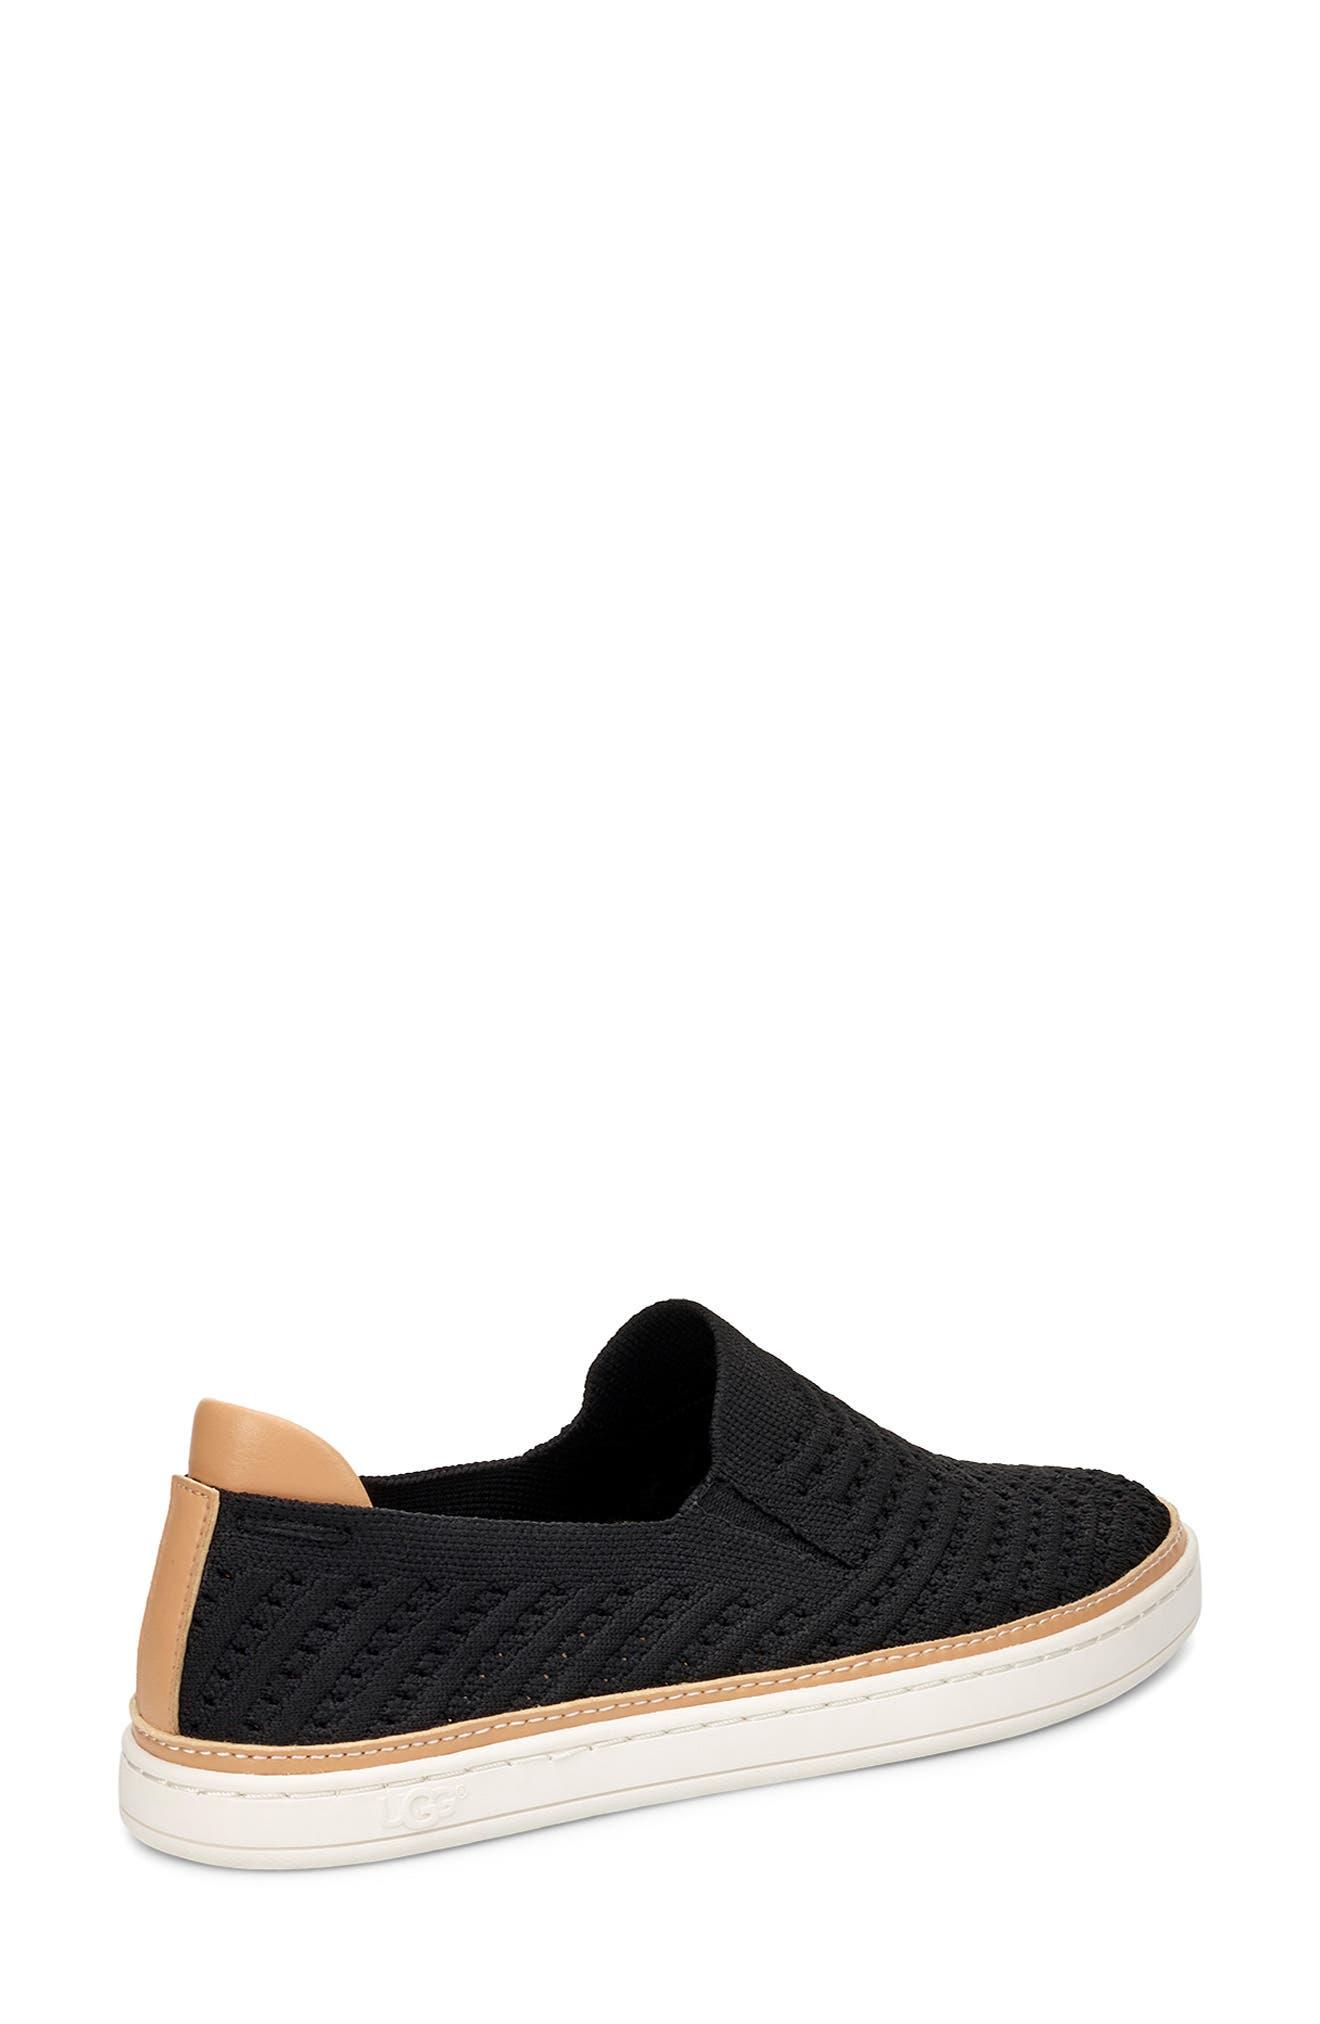 UGG<SUP>®</SUP>, Sammy Slip-On Sneaker, Alternate thumbnail 2, color, BLACK FABRIC